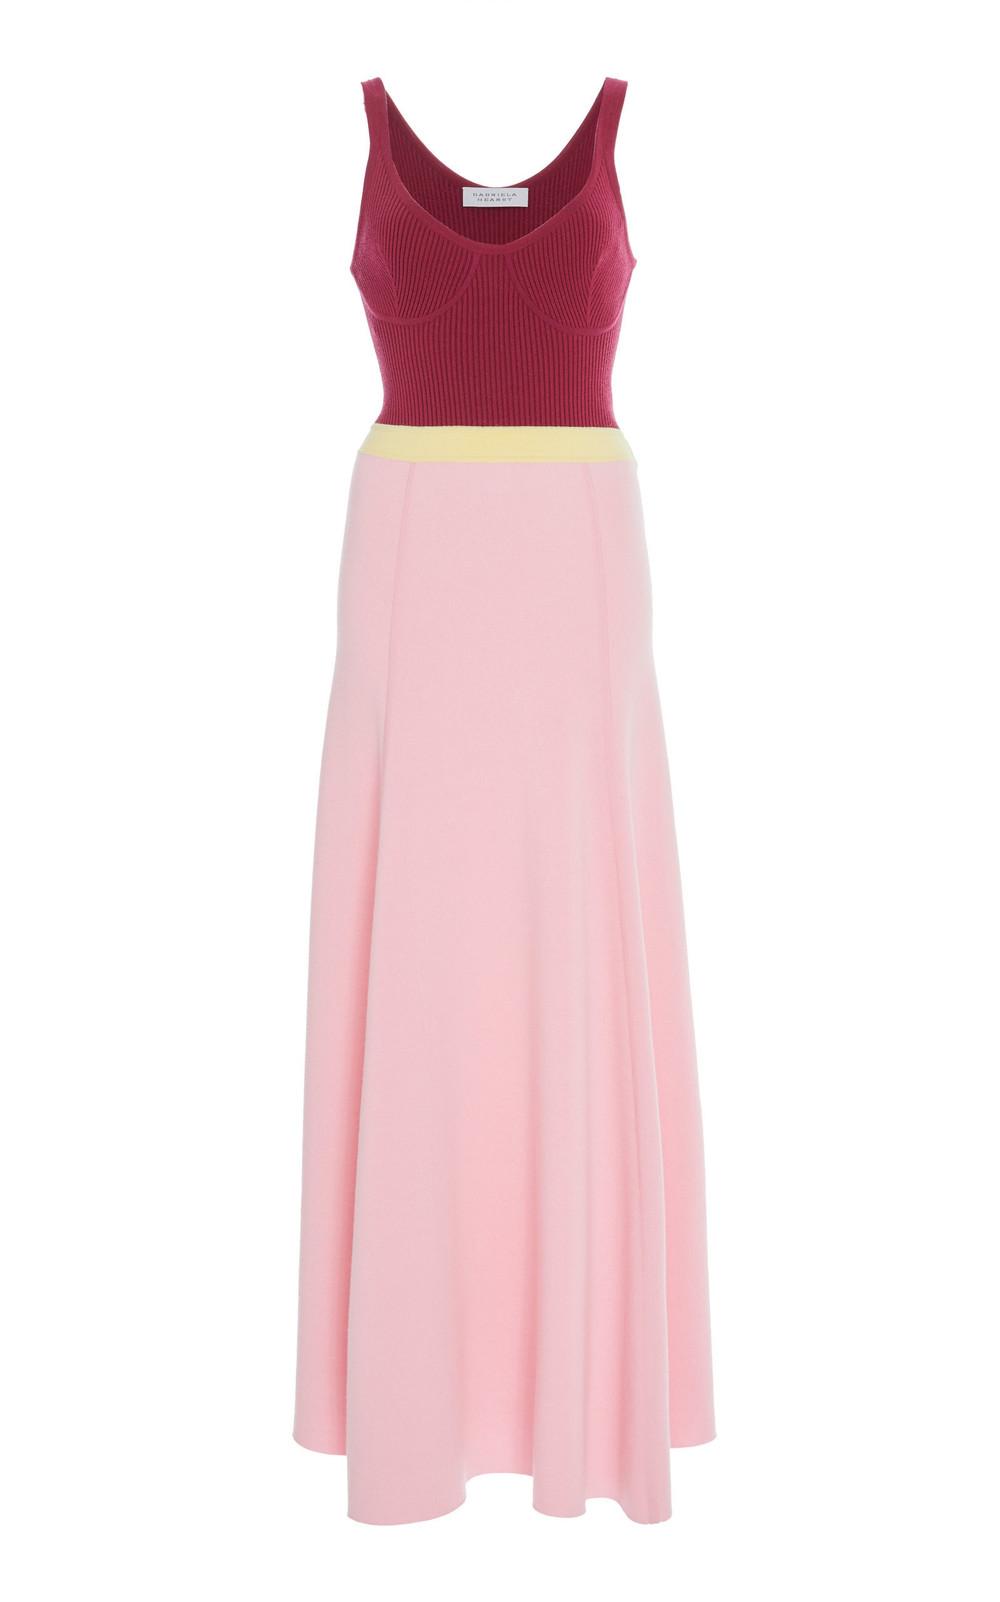 Gabriela Hearst Flaminius Virgin Wool Rib-Knit Dress in multi